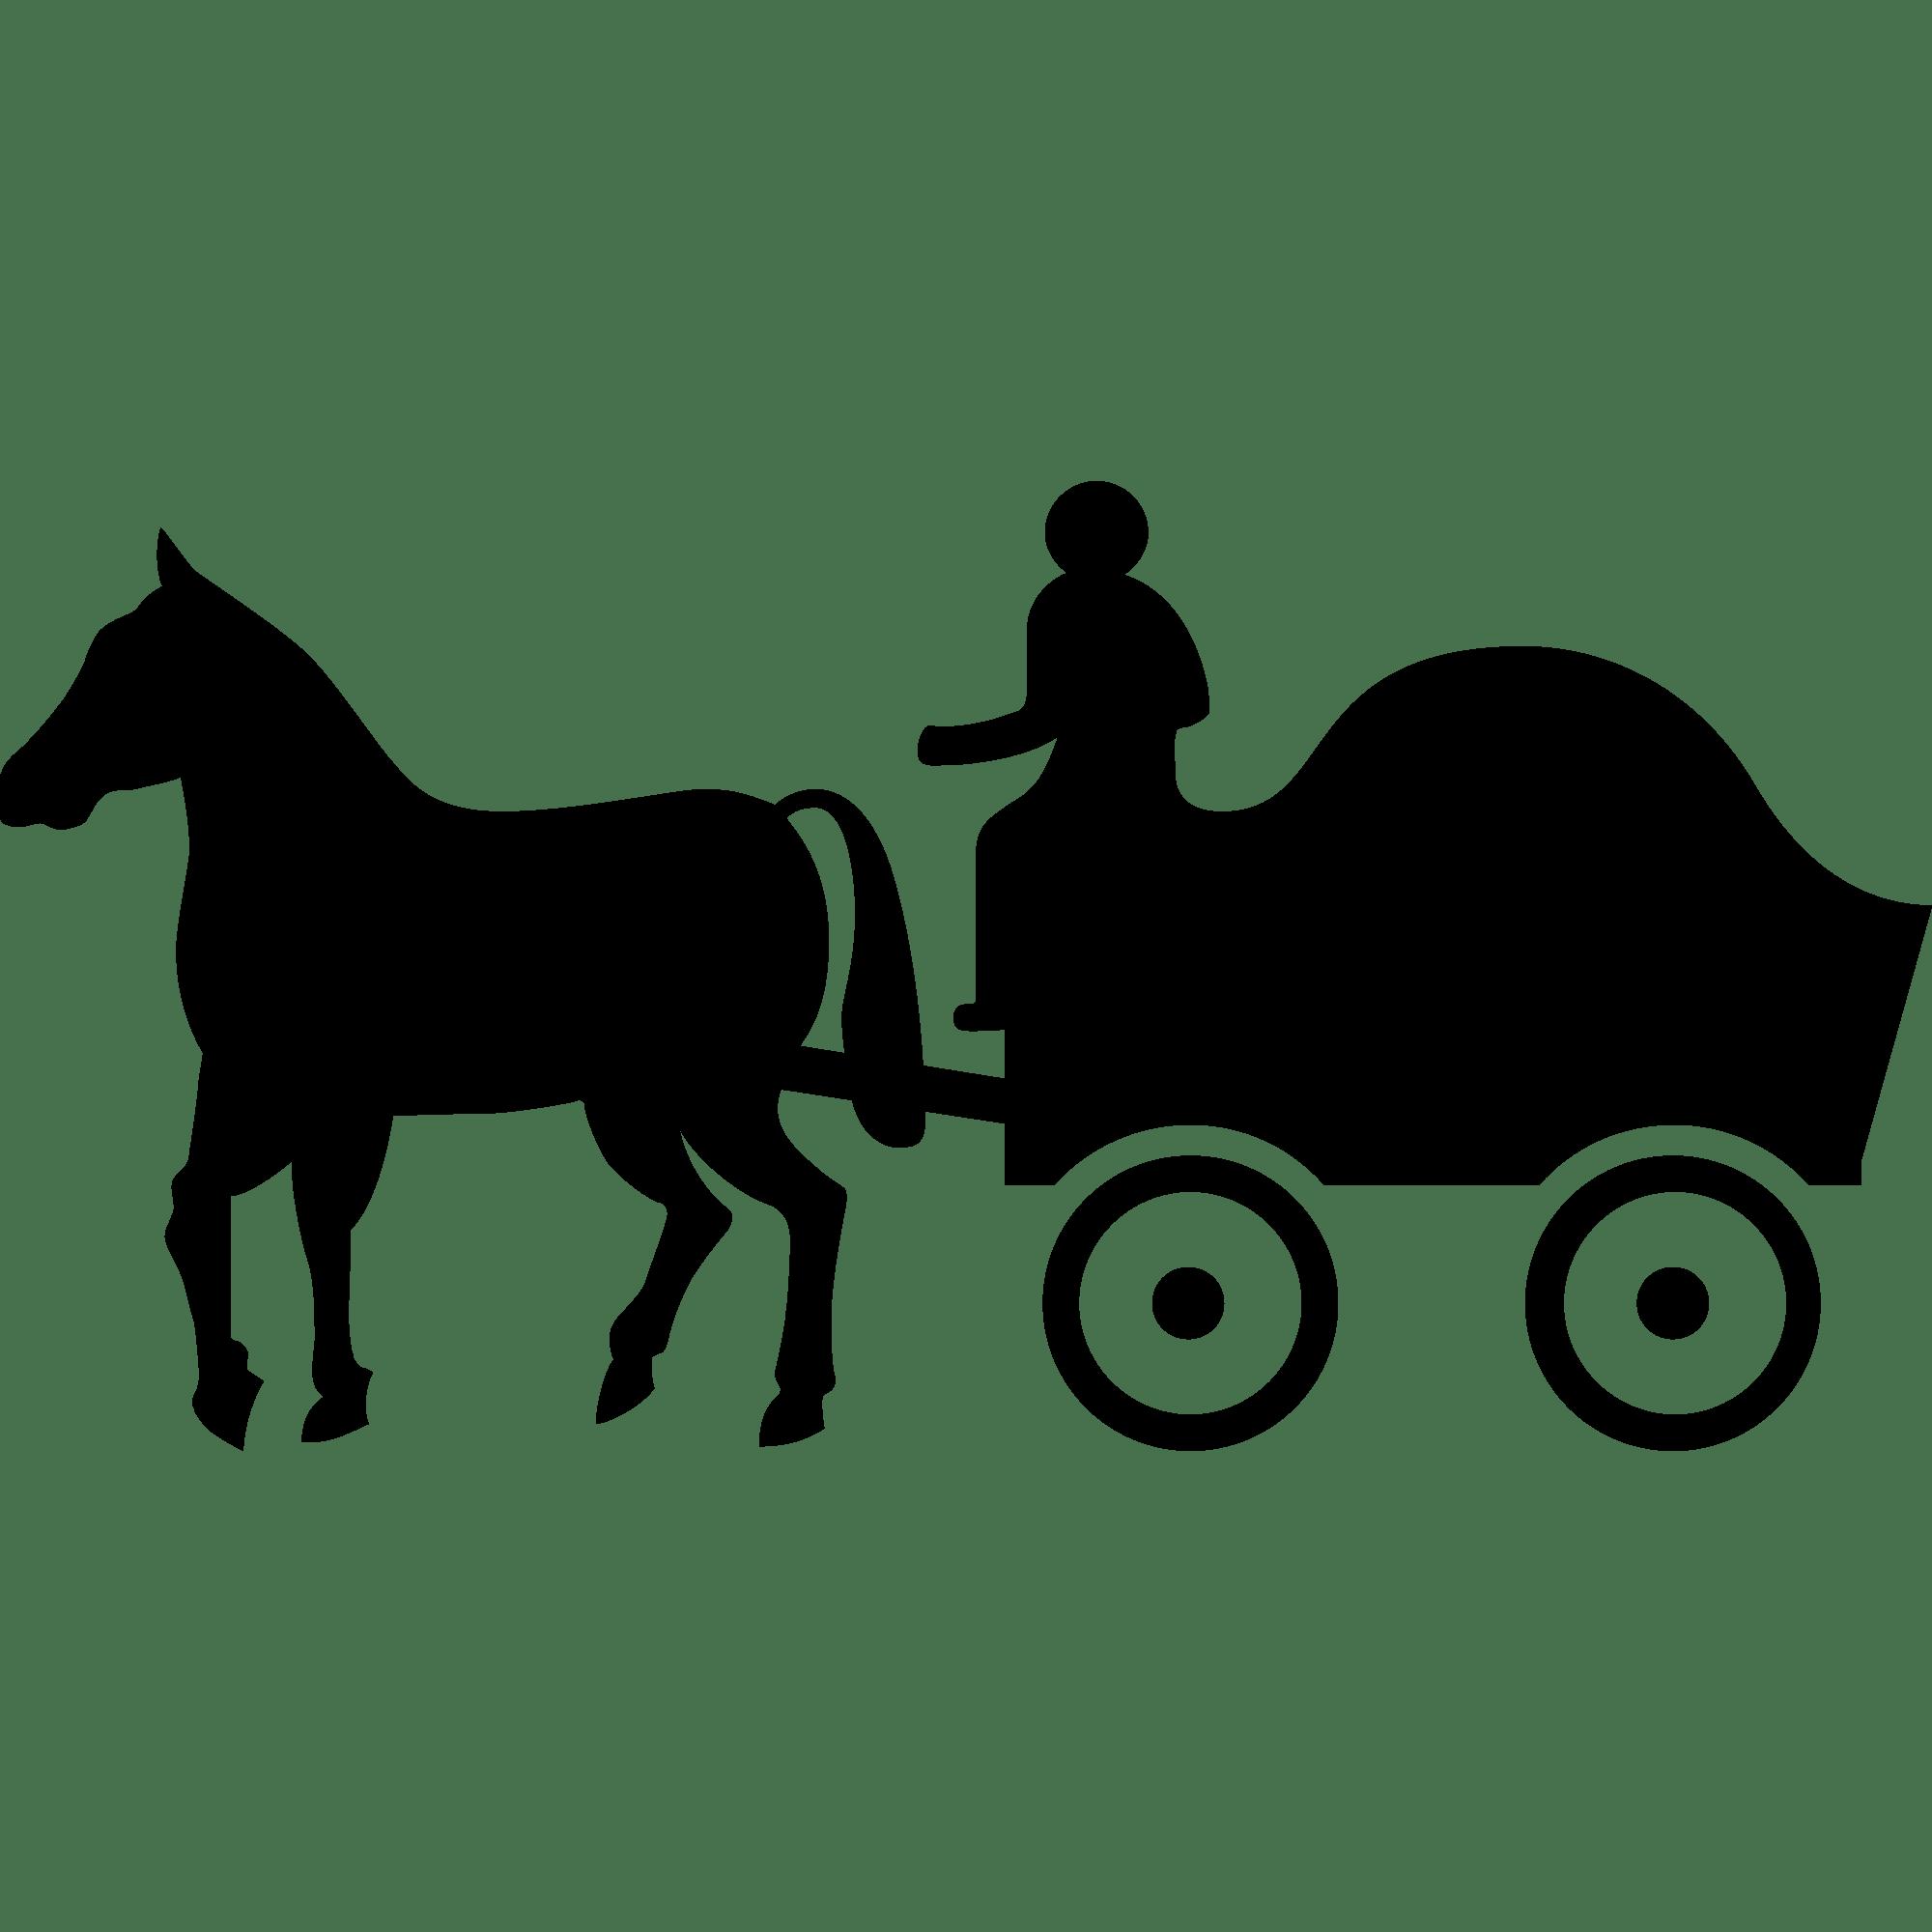 Pioneer Clipart Horse Drawn Wagon Pioneer Horse Drawn